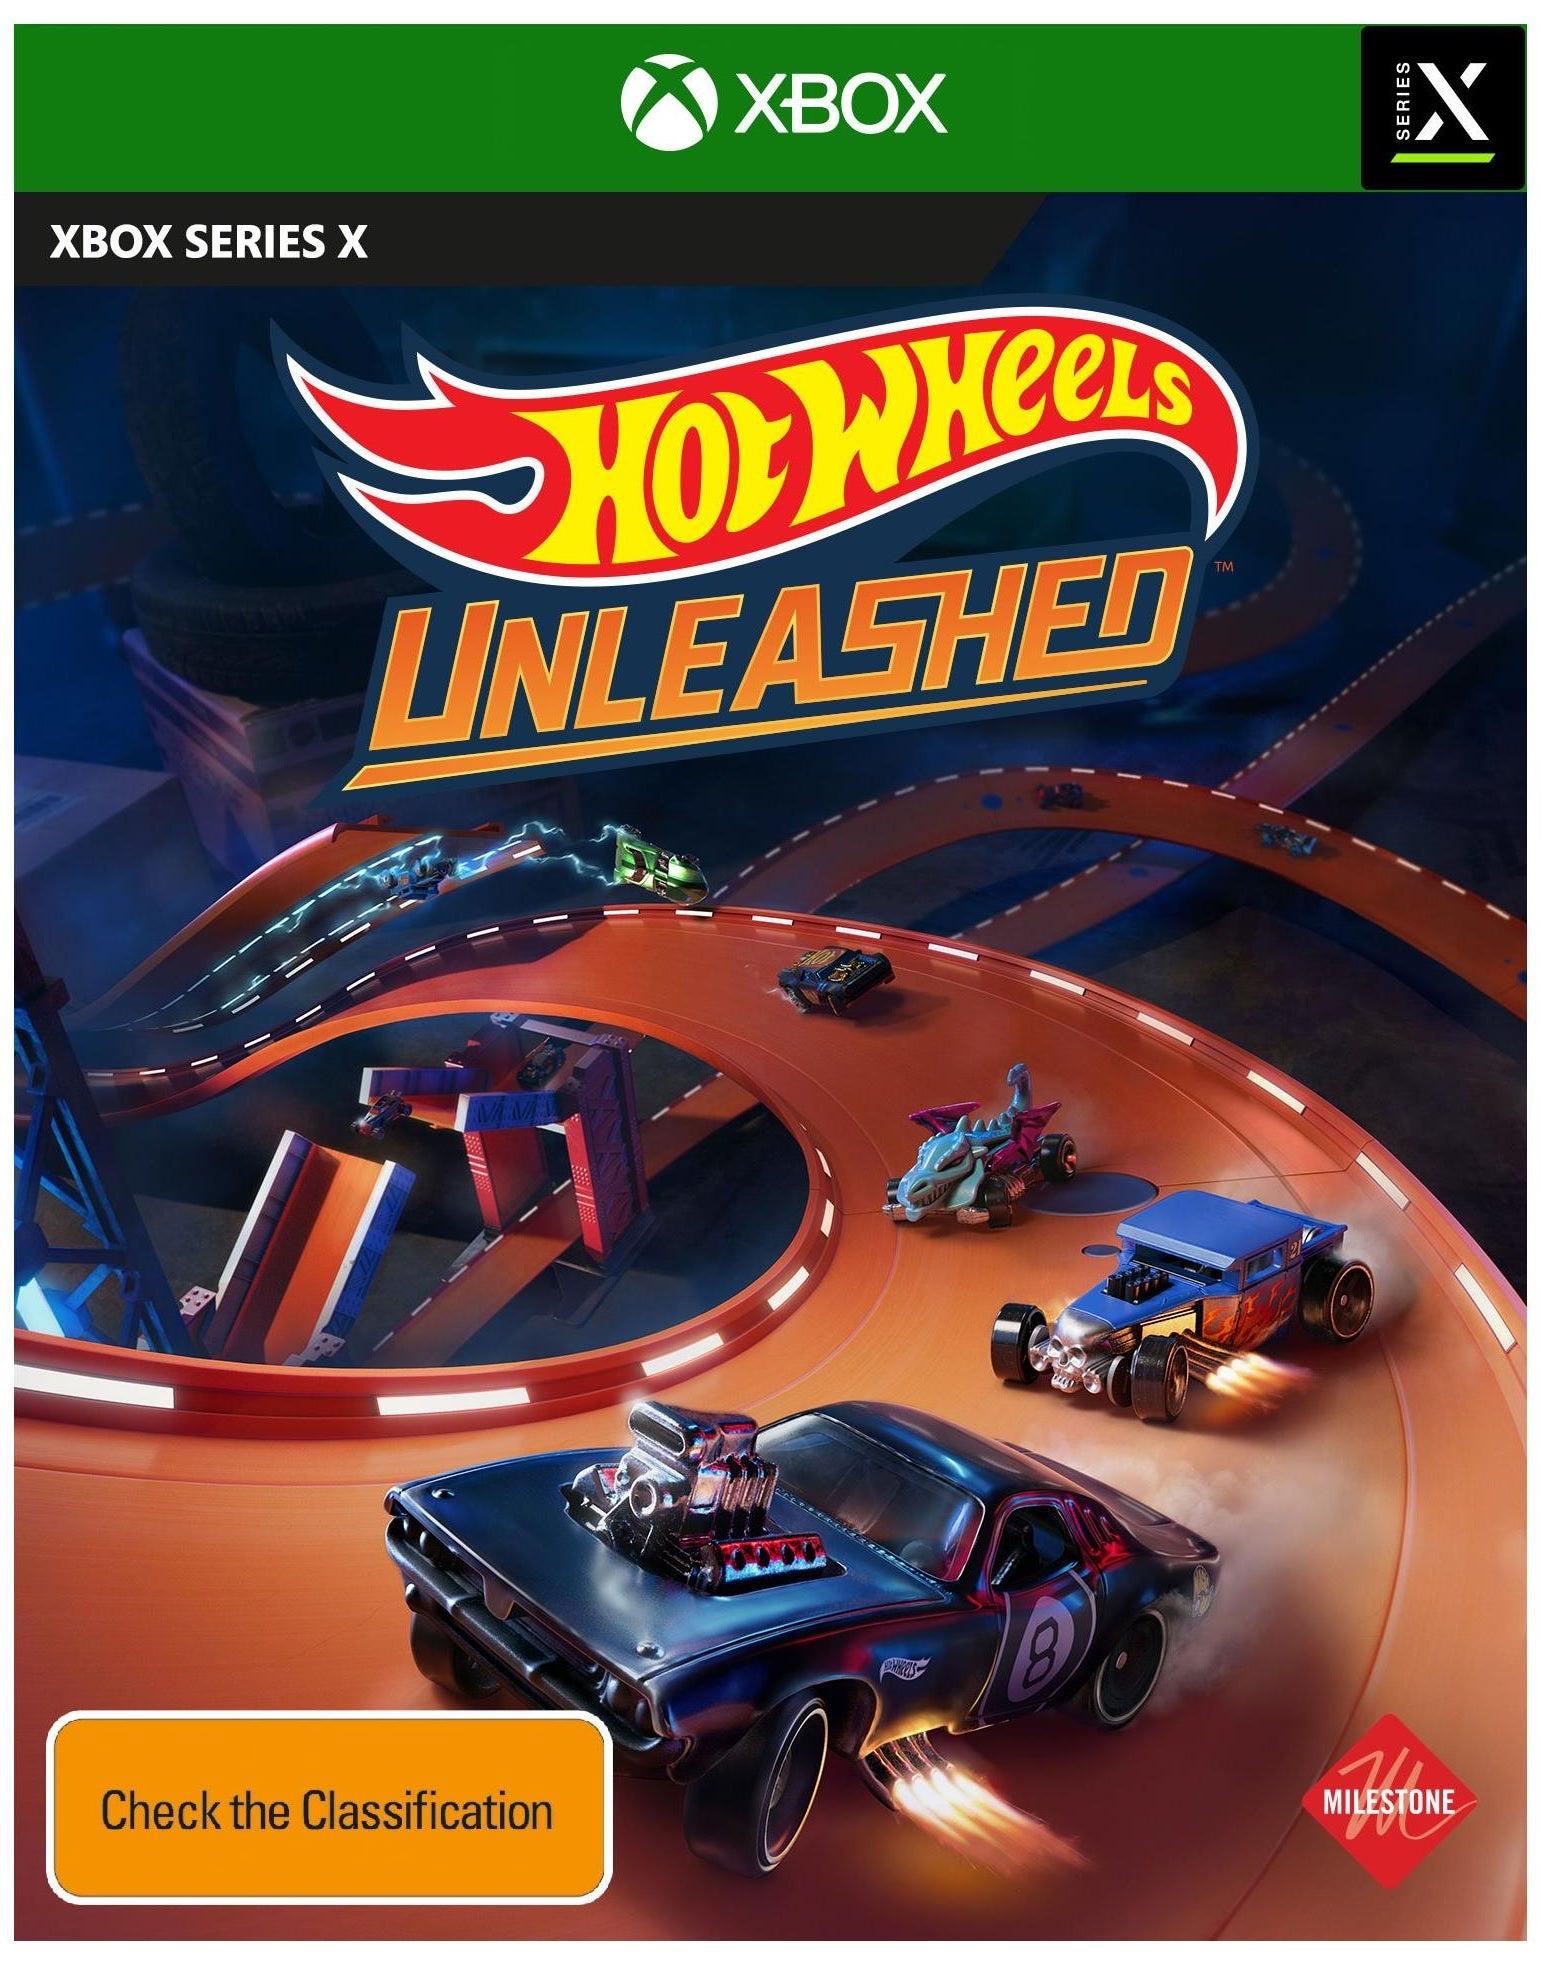 Milestone Hot Wheels Unleashed Xbox Series X Game